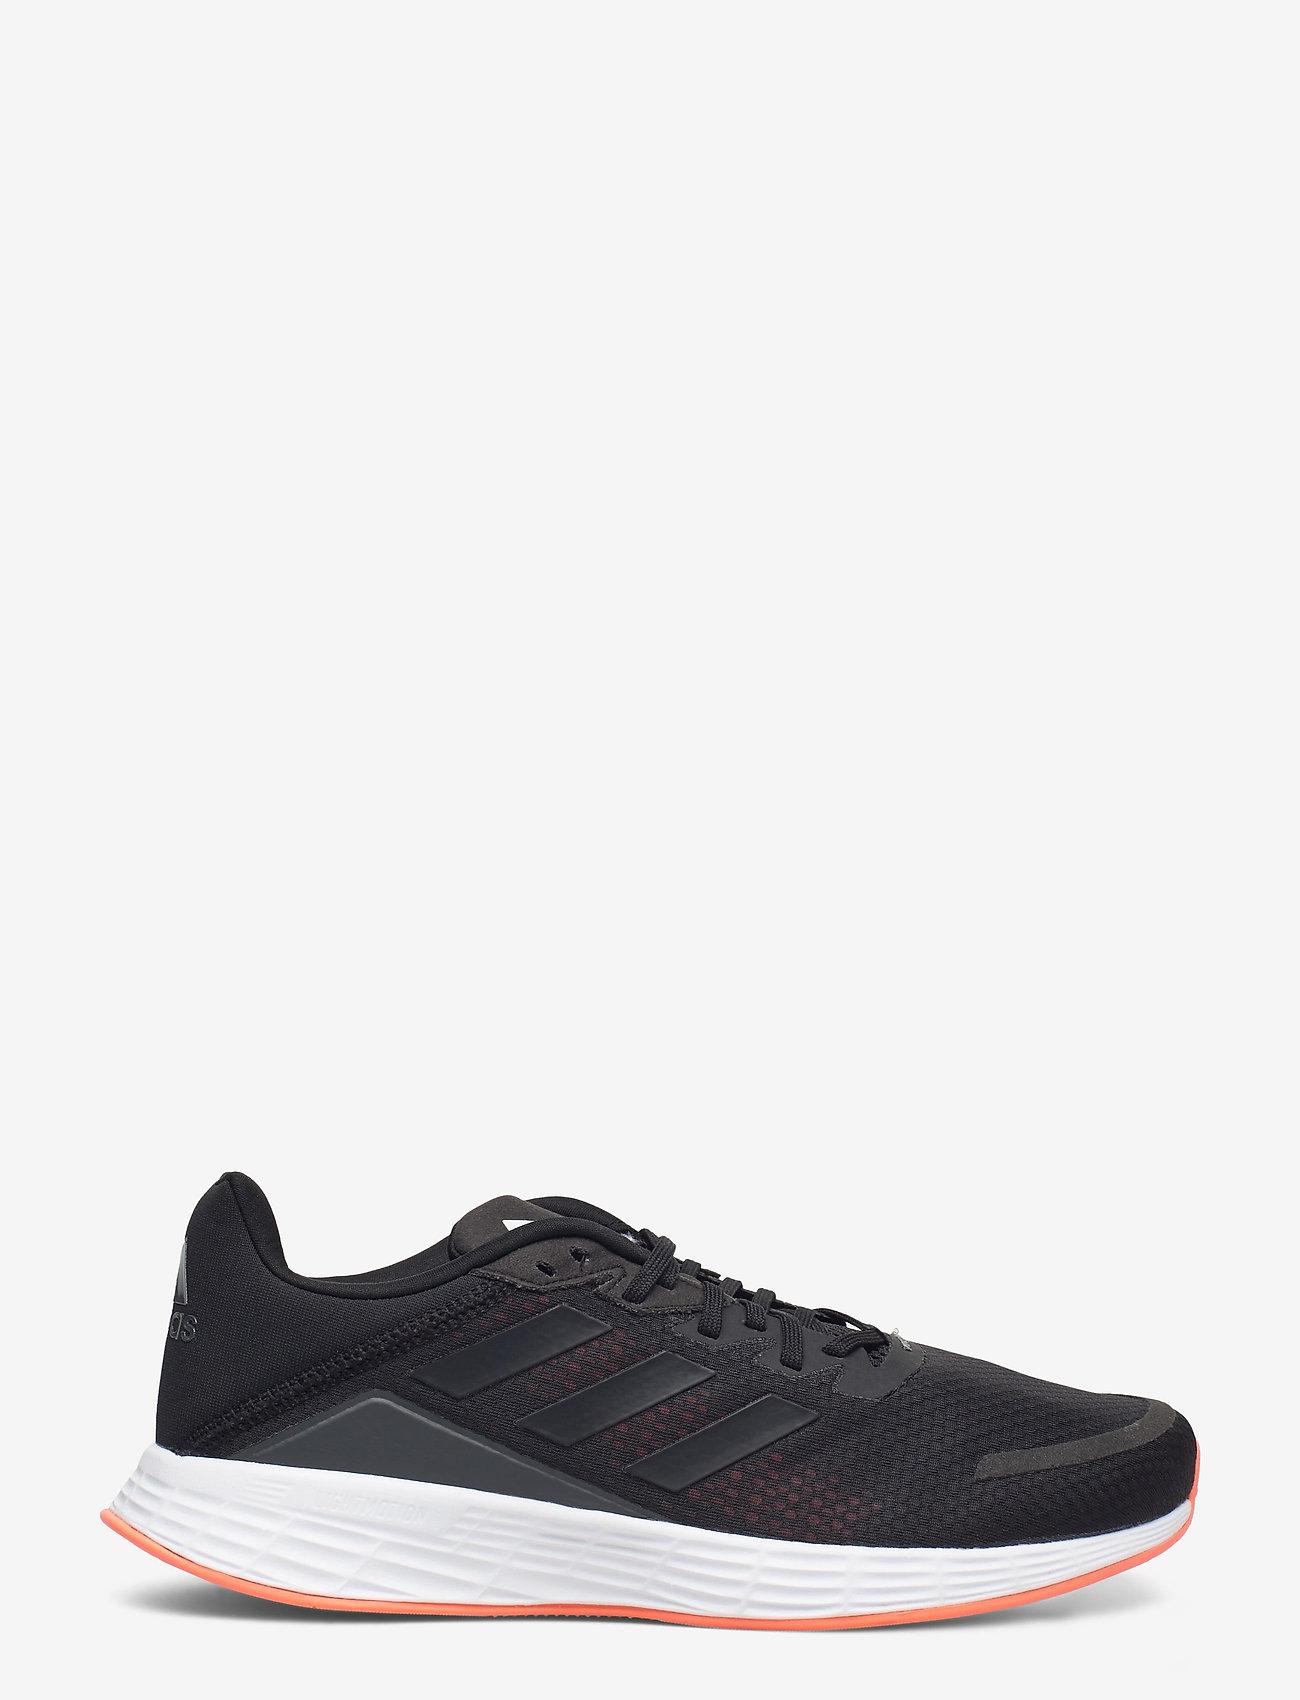 adidas Performance - Duramo SL - löbesko - cblack/cblack/gresix - 1